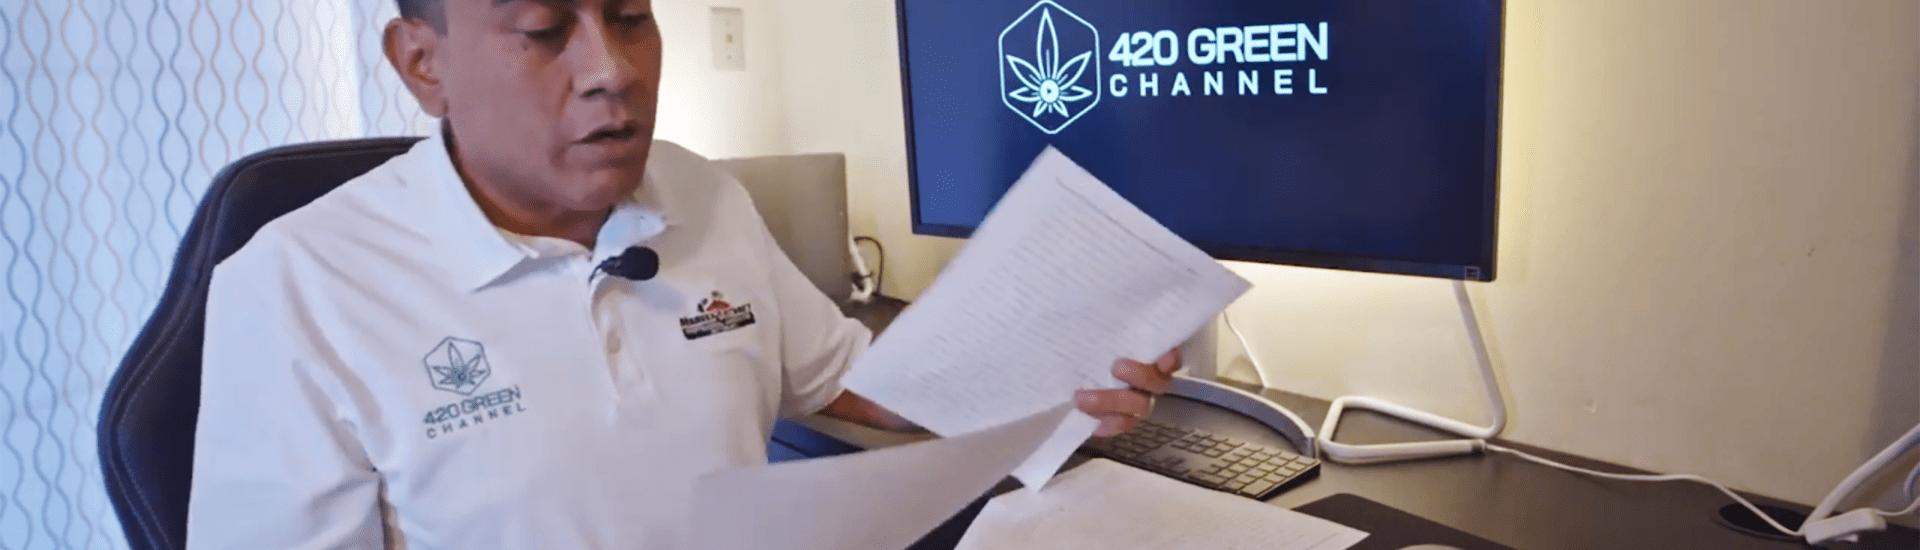 Marley's Planet presenta denuncia contra Estado peruano por irregularidades en licitación para compra de aceite de cannabis